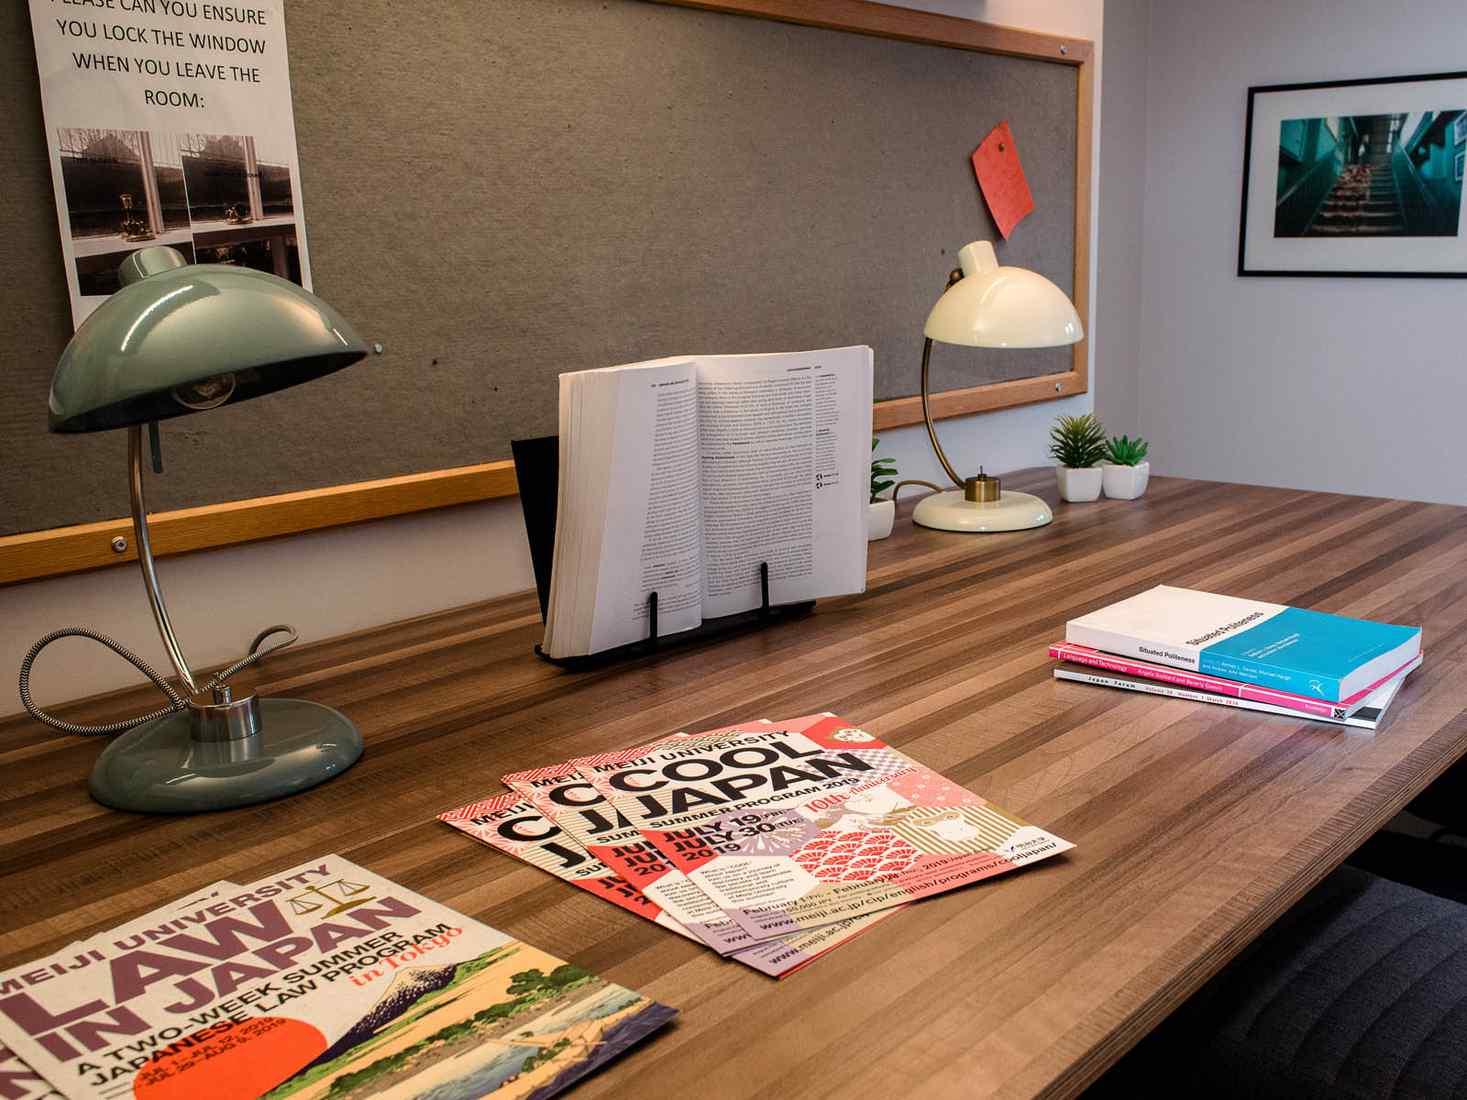 Japanese magazines on table